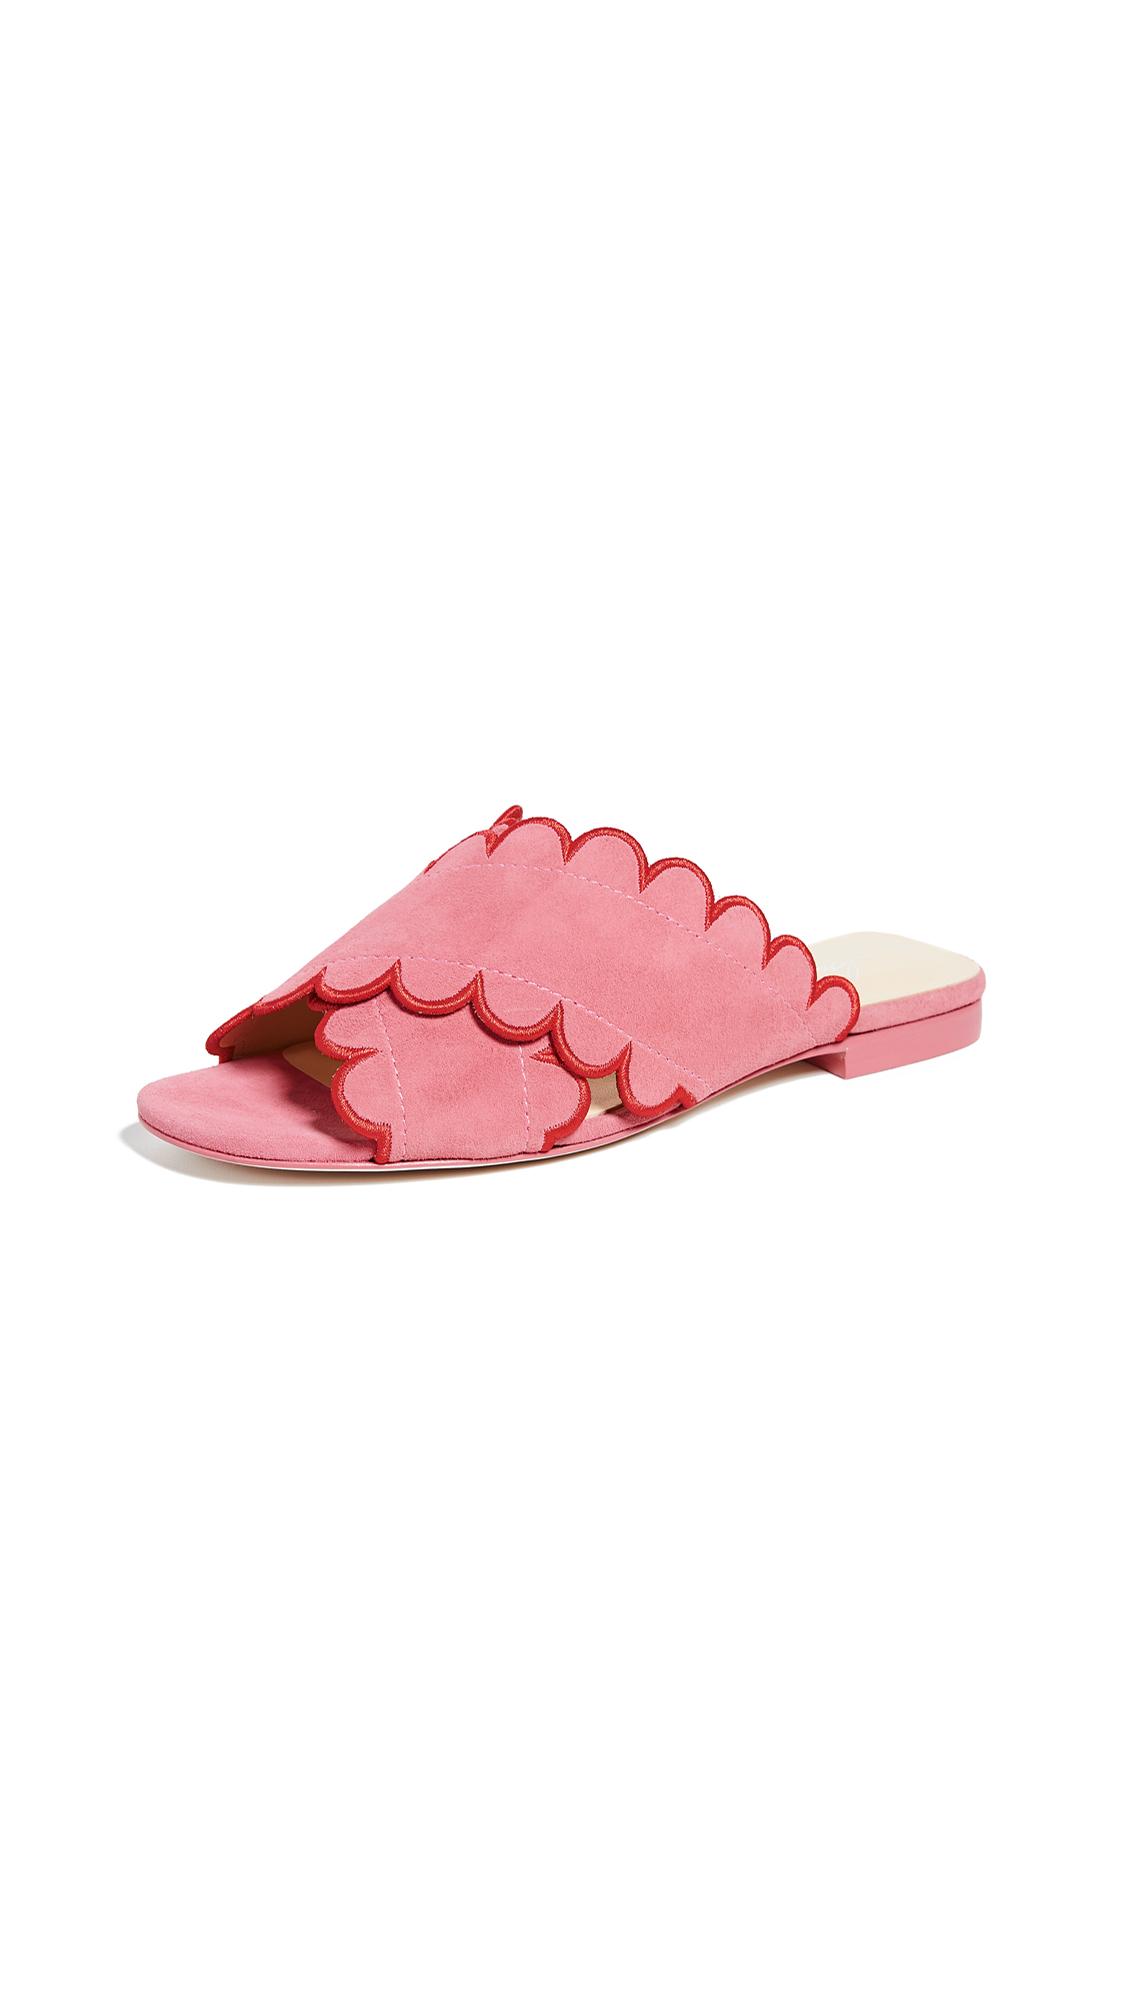 Isa Tapia Nueva Scallop Flat Sandals - Flamingo Pink